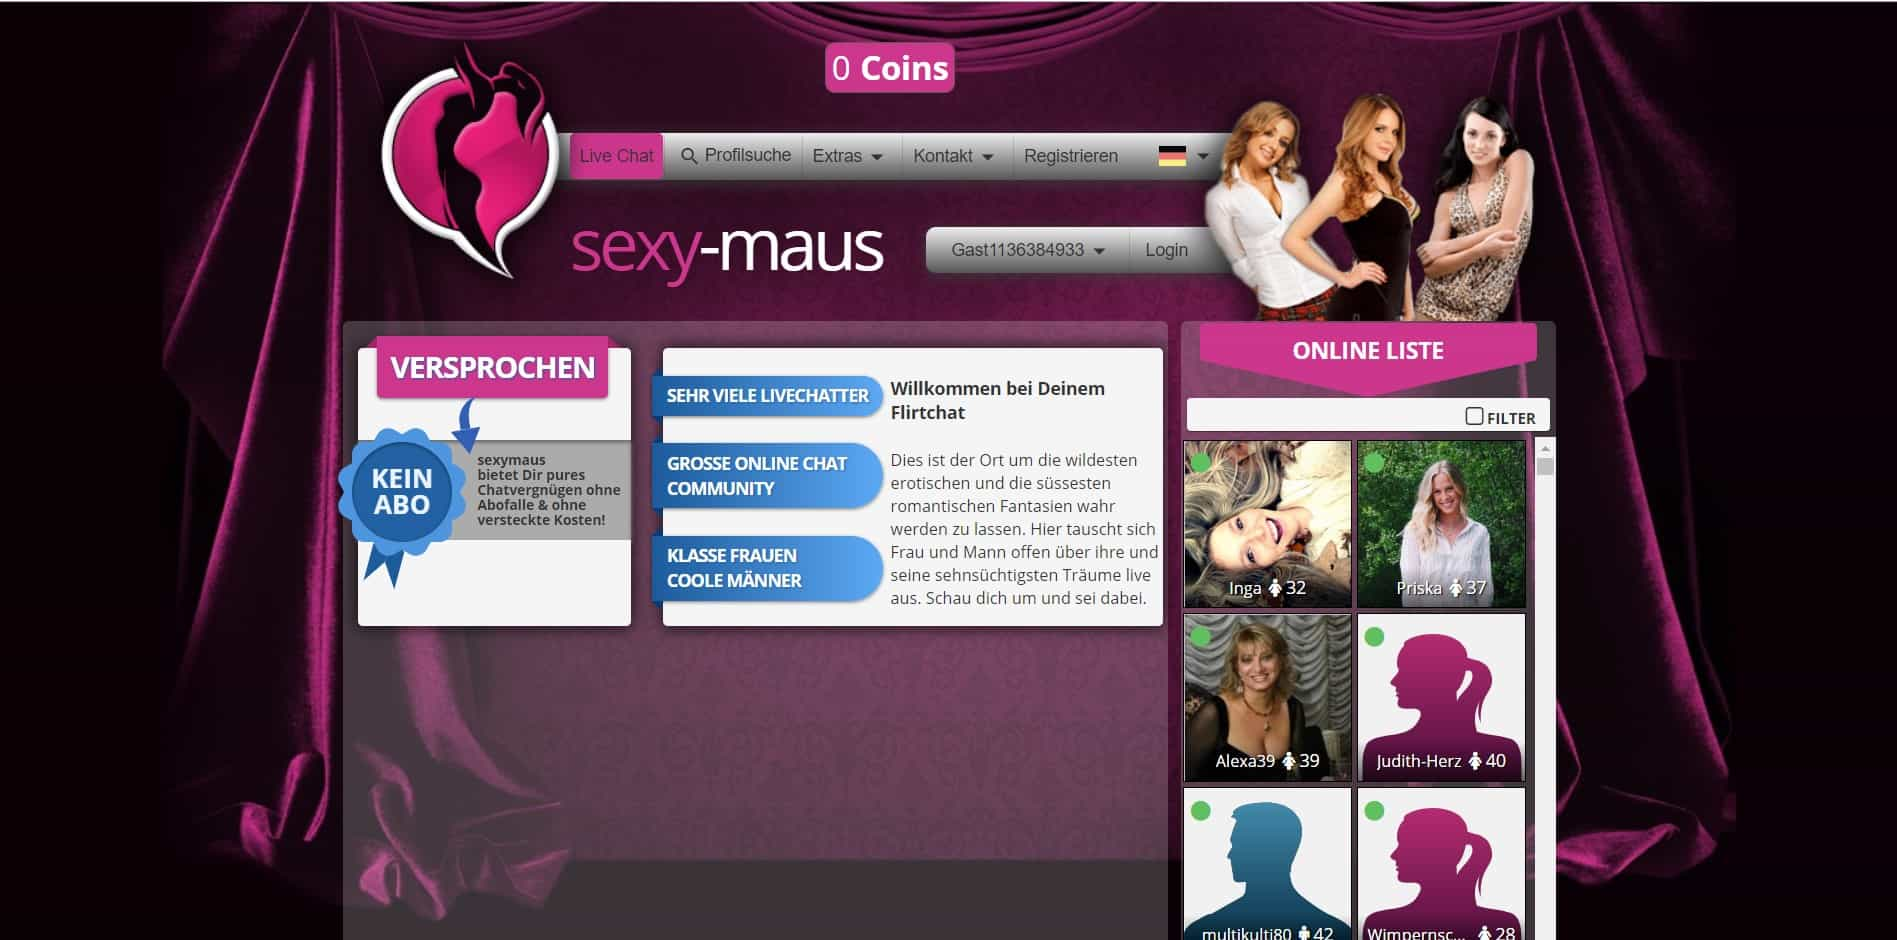 Testbericht: SexyMaus.com Abzocke